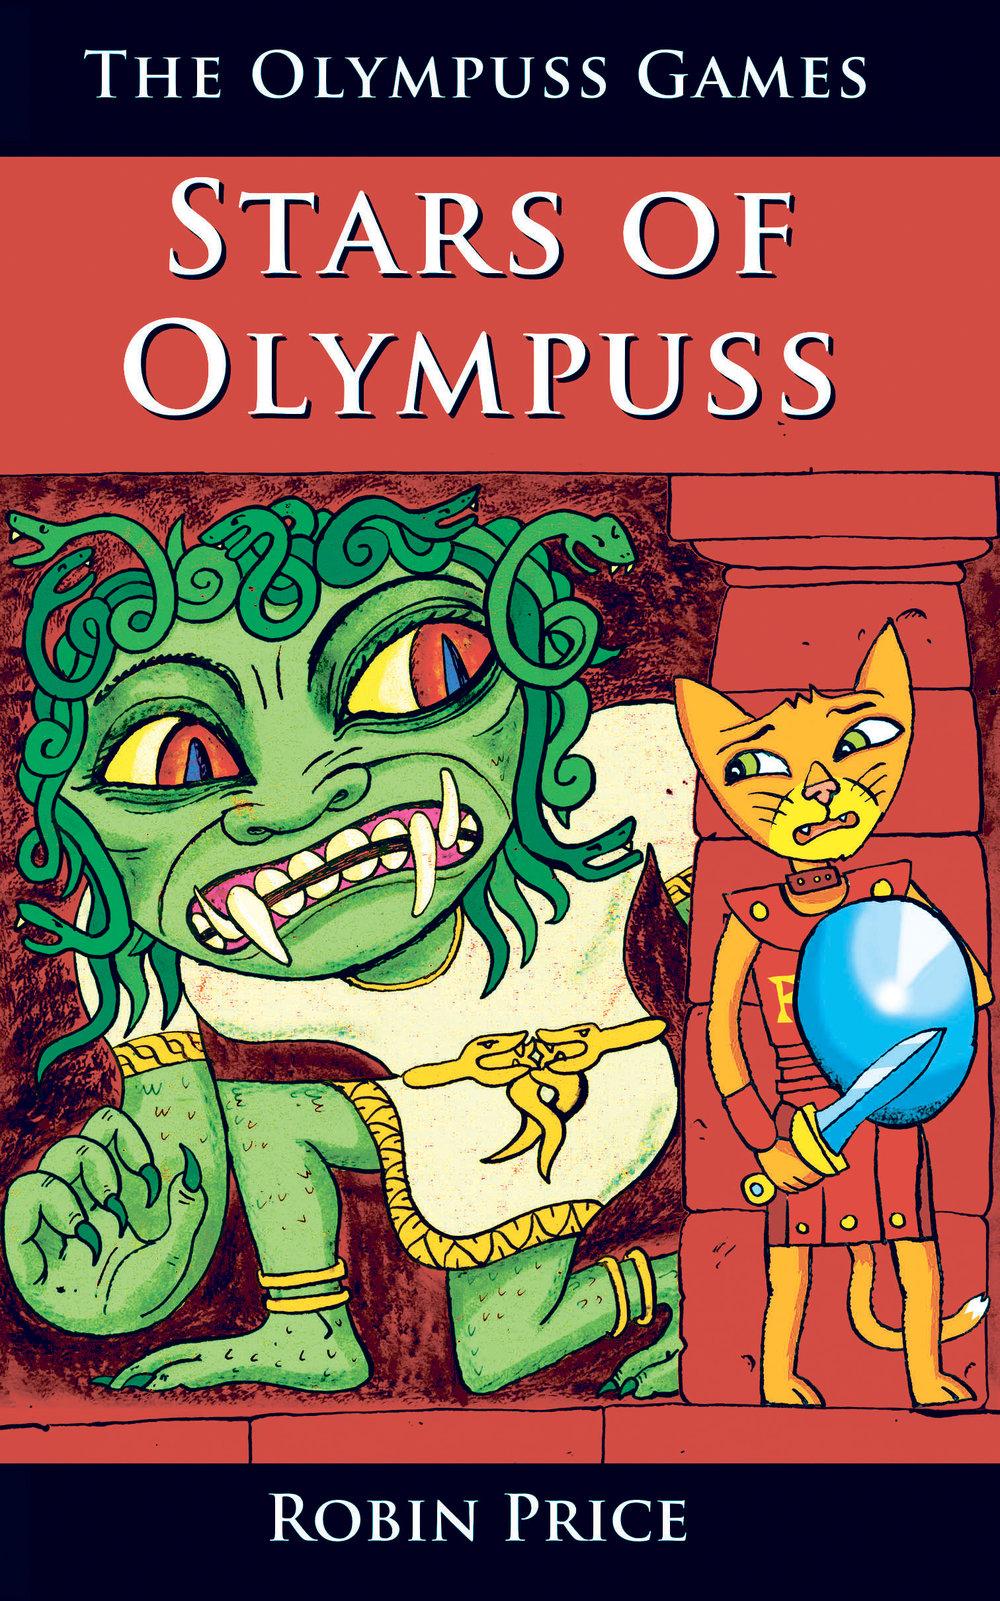 Olympuss-Games_Book4_stars_of_olympuss.jpg